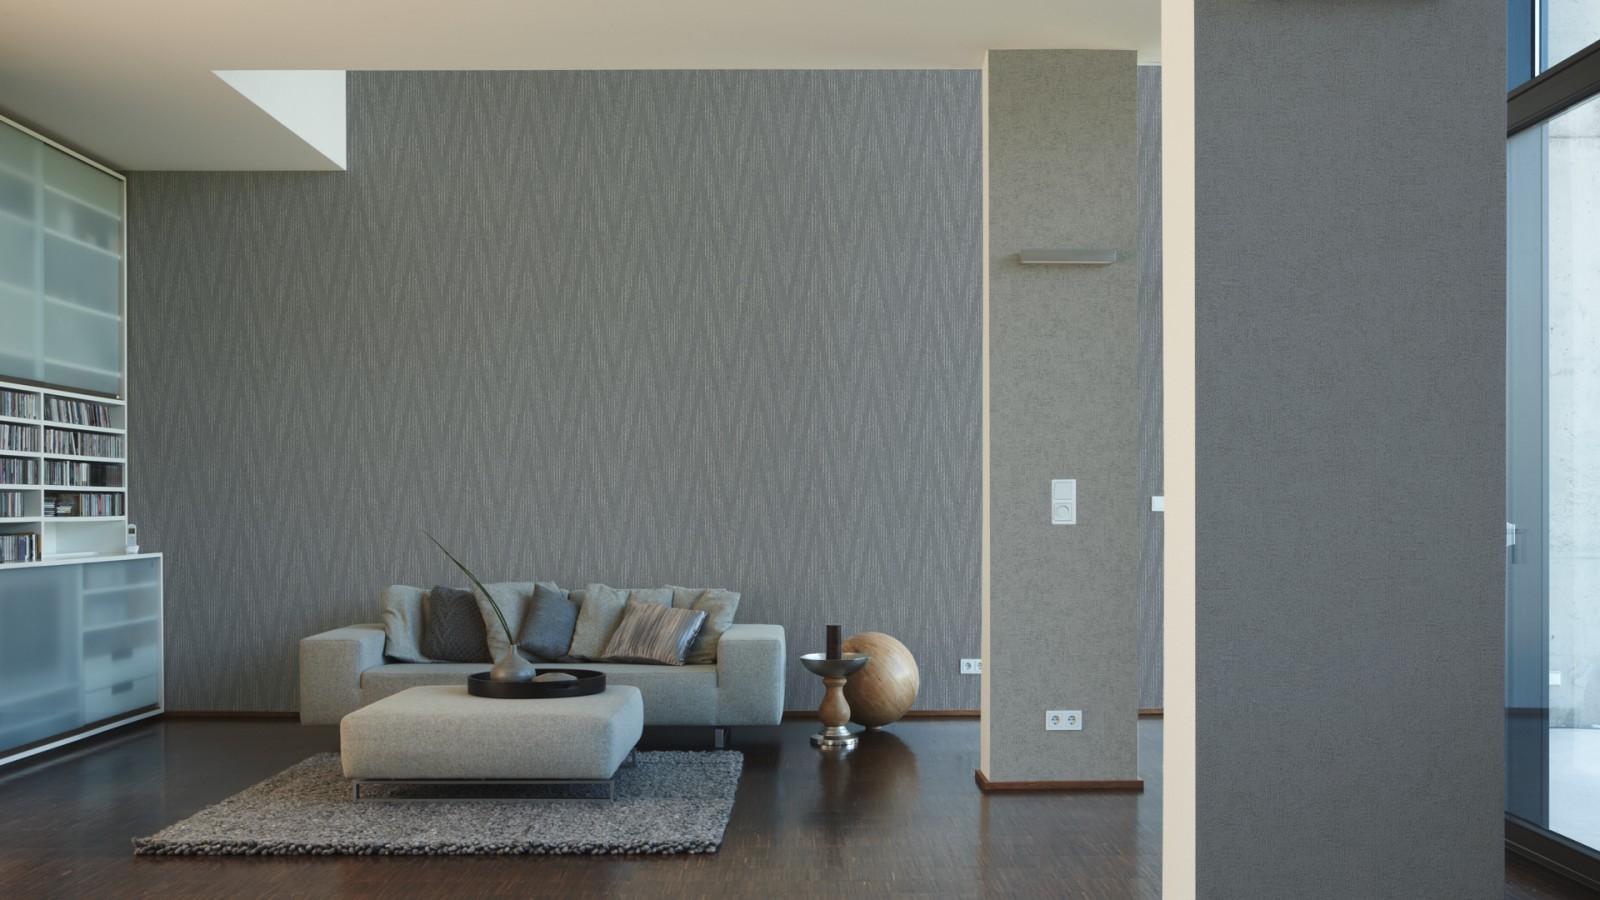 tapete vlies gestreift metallic grau livingwalls 30645 3. Black Bedroom Furniture Sets. Home Design Ideas